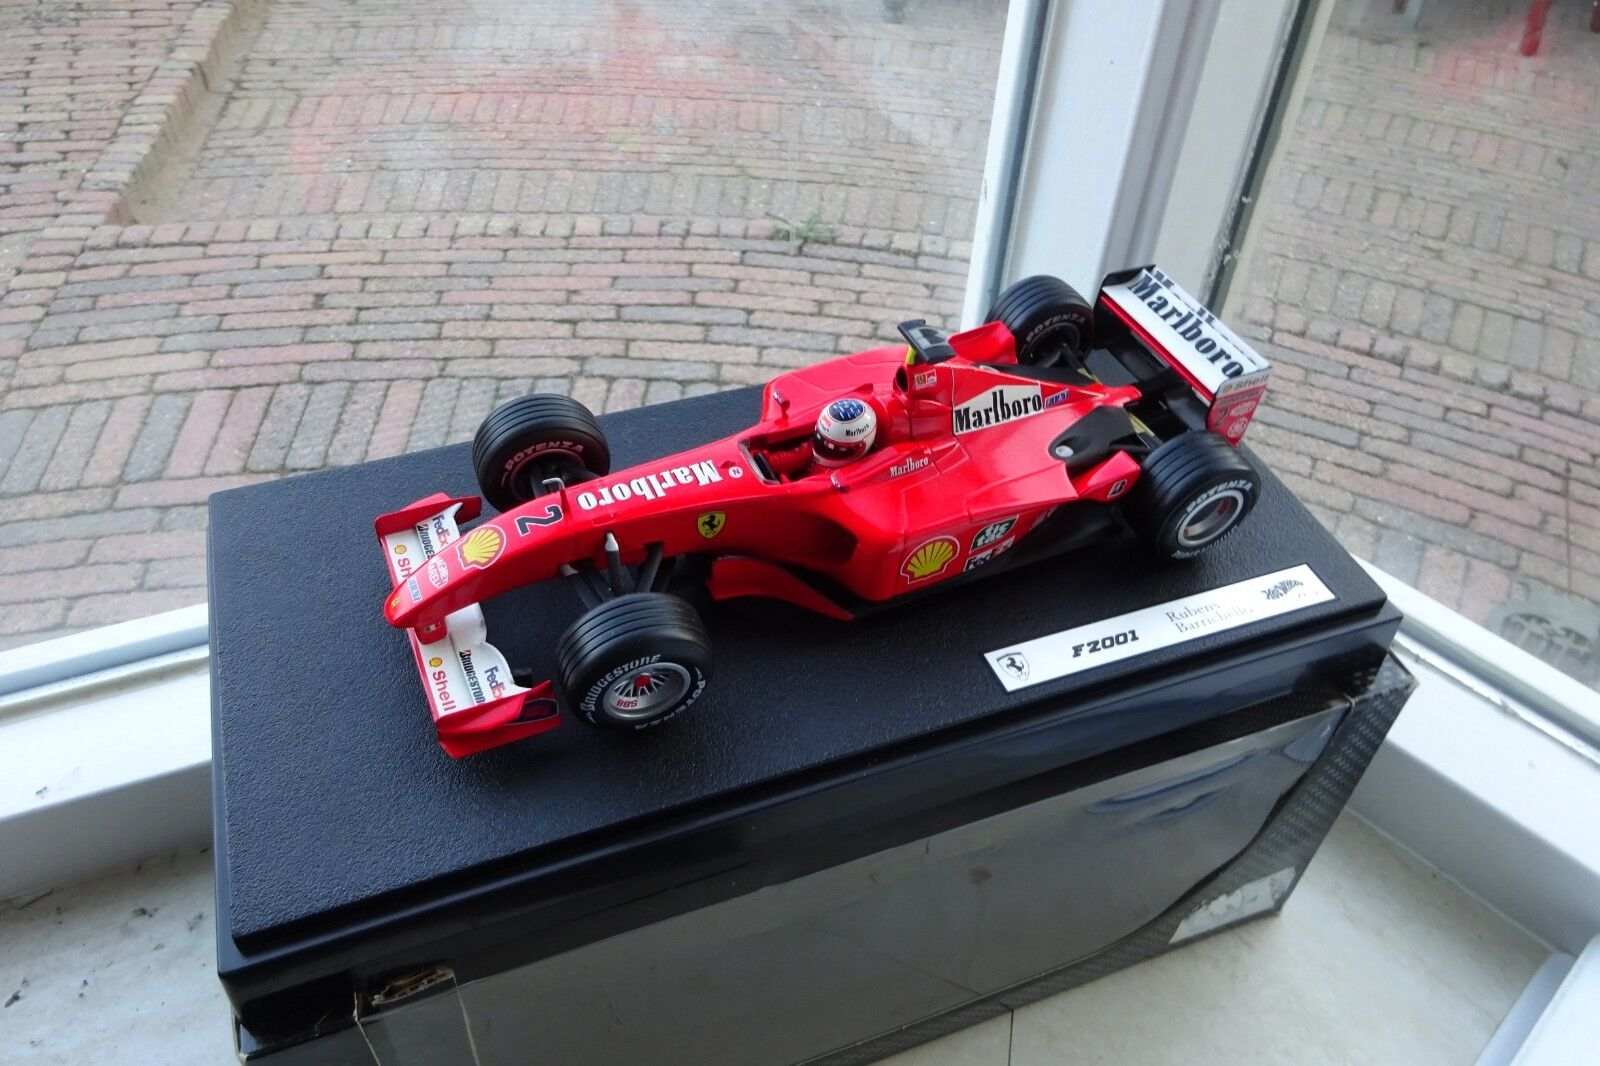 Hot Wheels 1/18 Scale diecast - 50203 MBORO Ferrari F2001 Rubens Barrichello  2